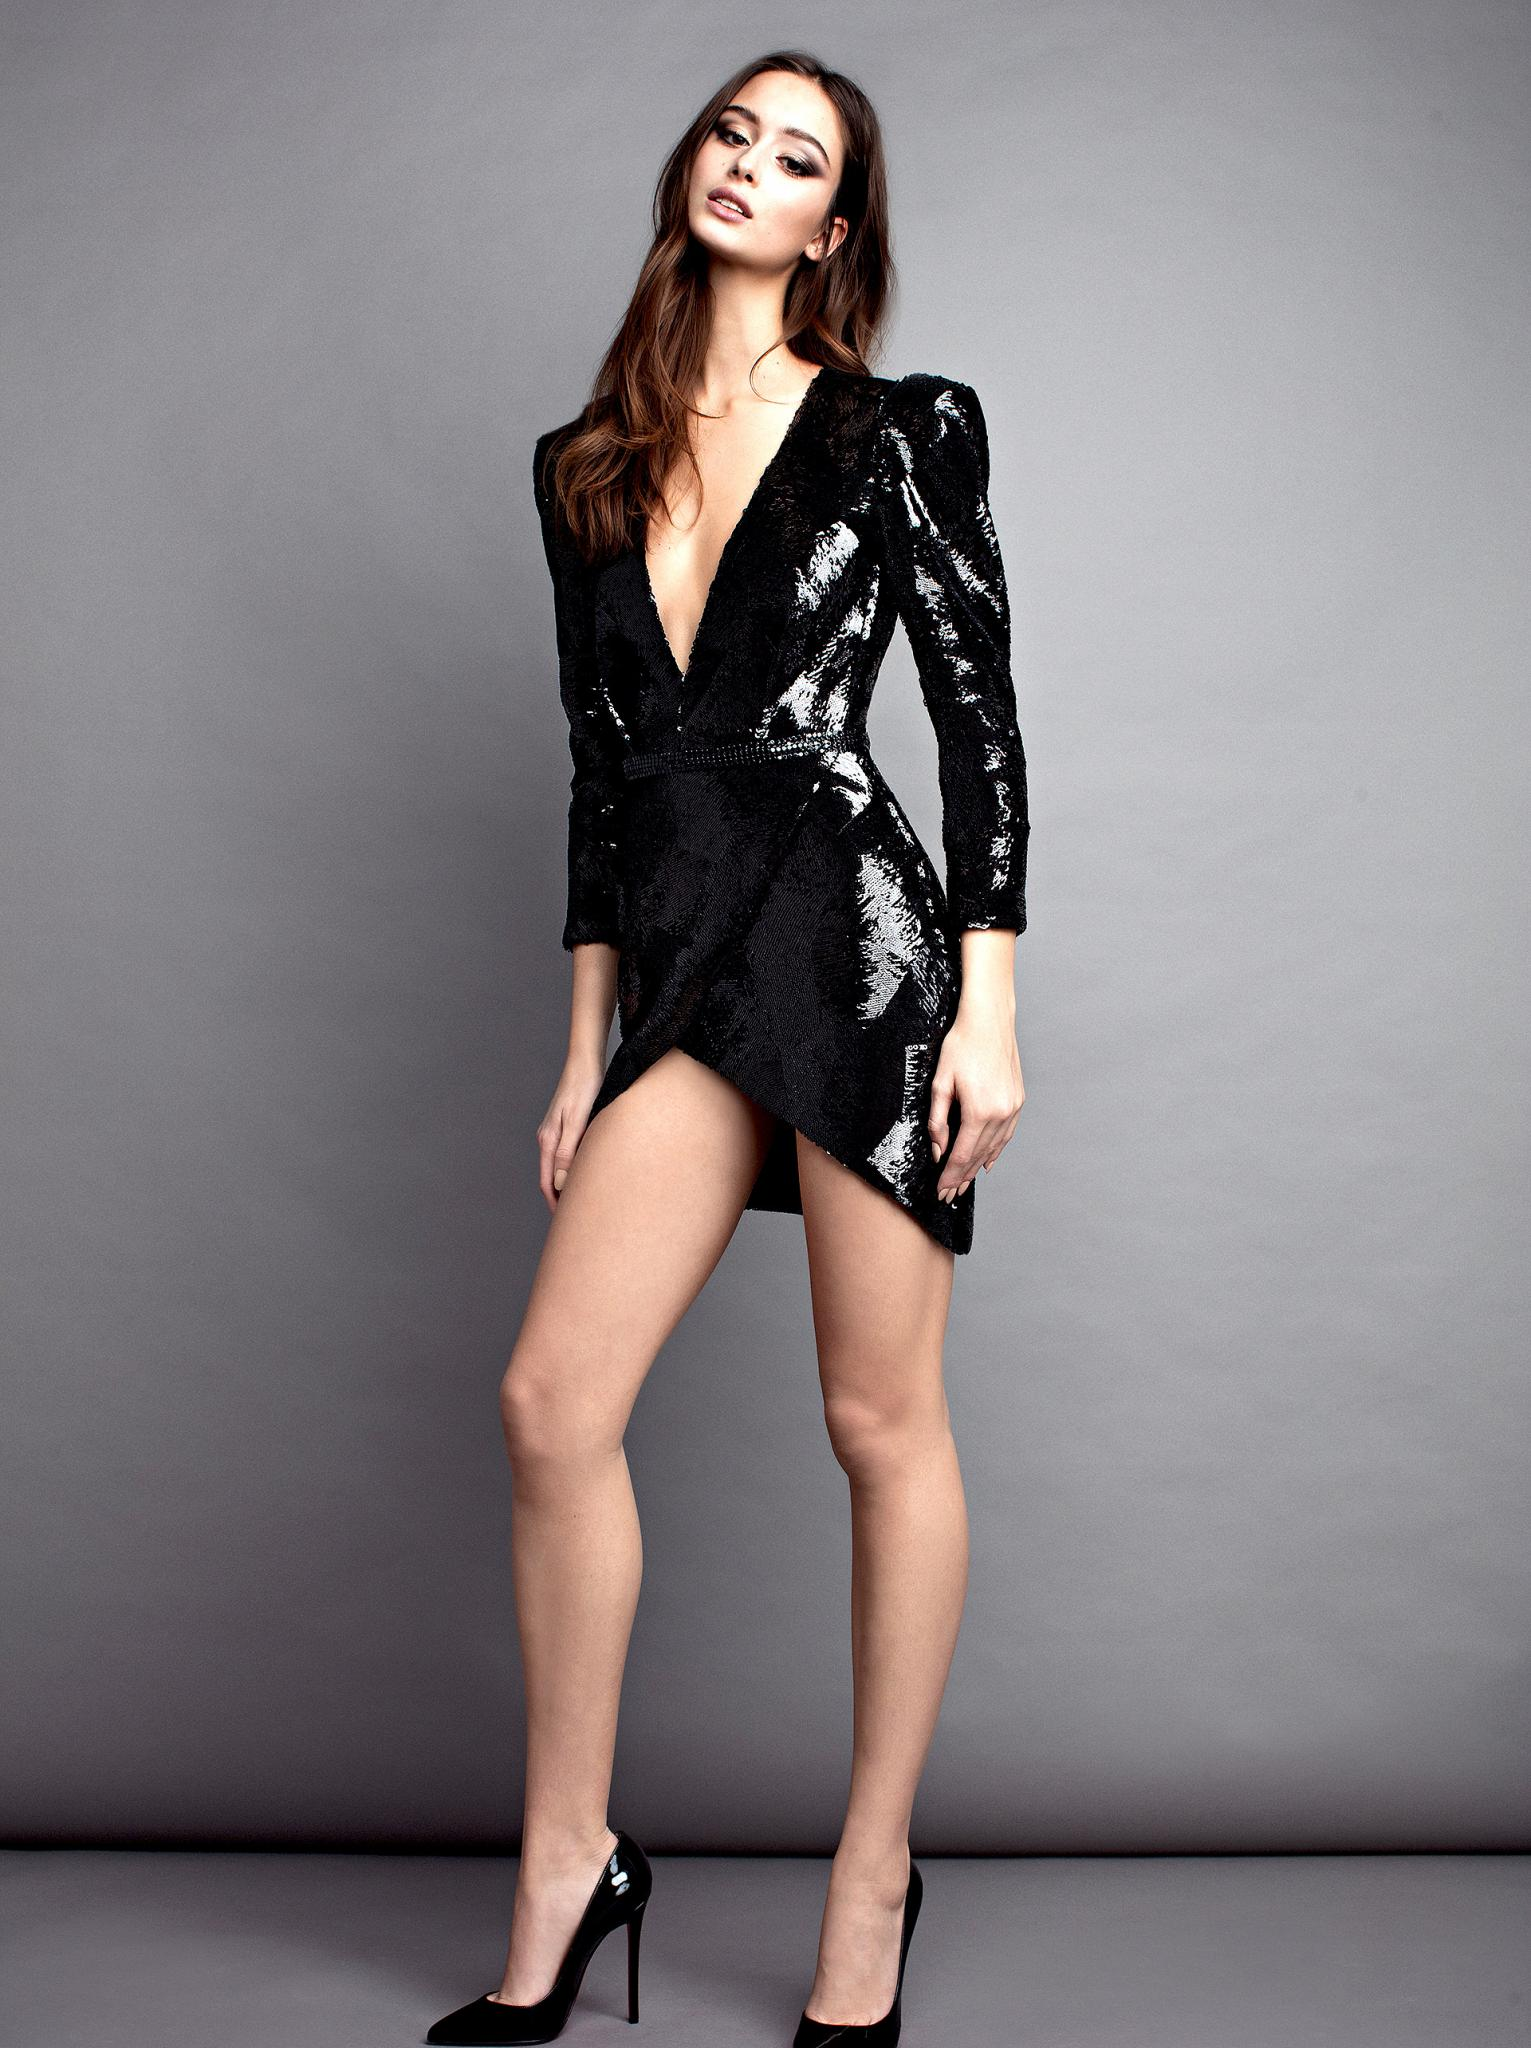 Photos Elvira nudes (21 photo), Topless, Paparazzi, Boobs, lingerie 2017